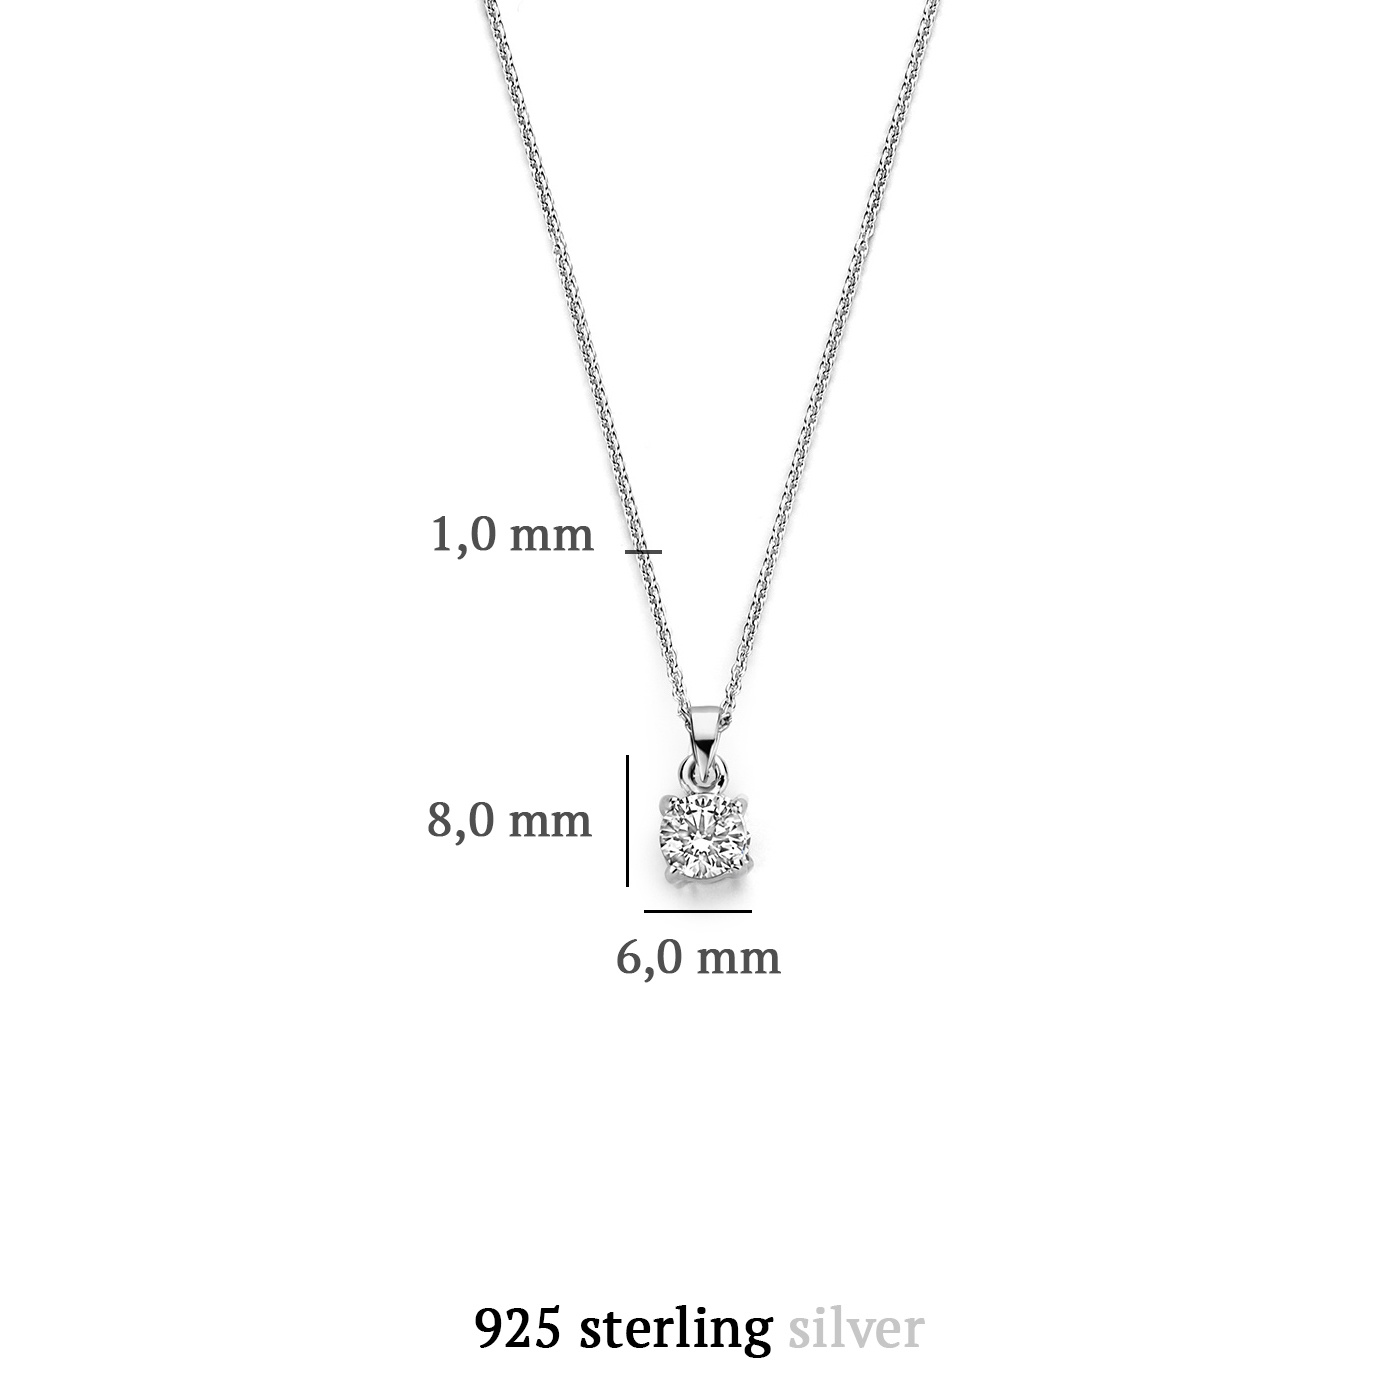 Parte di Me Bella Vita Sienna 925 Sterling Silber Kette